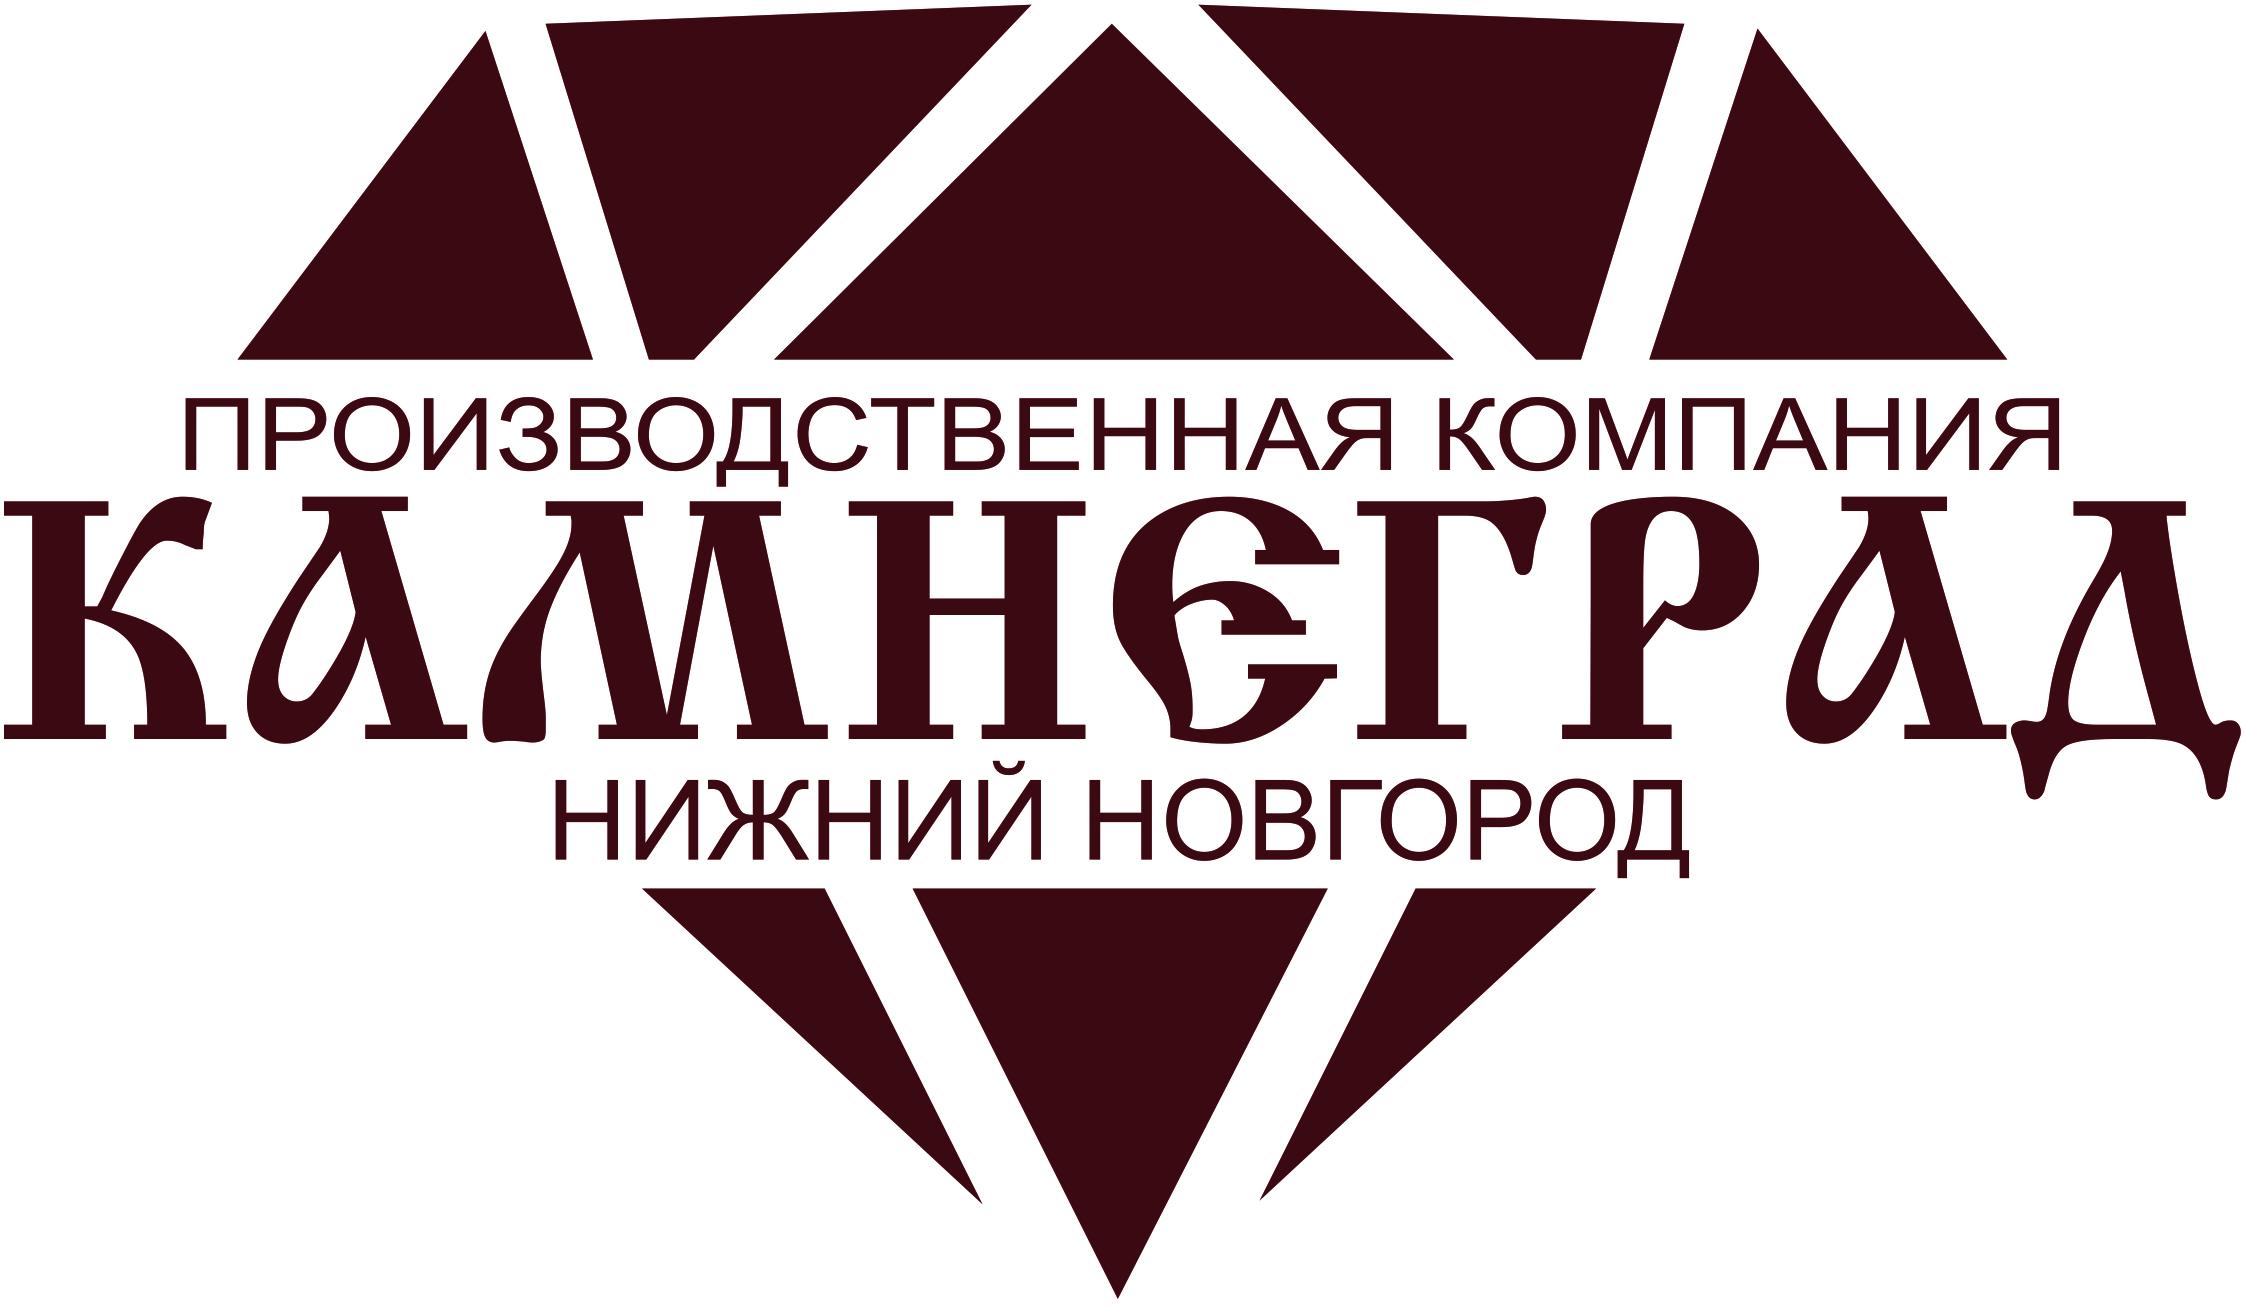 Камнеград Нижний Новгород